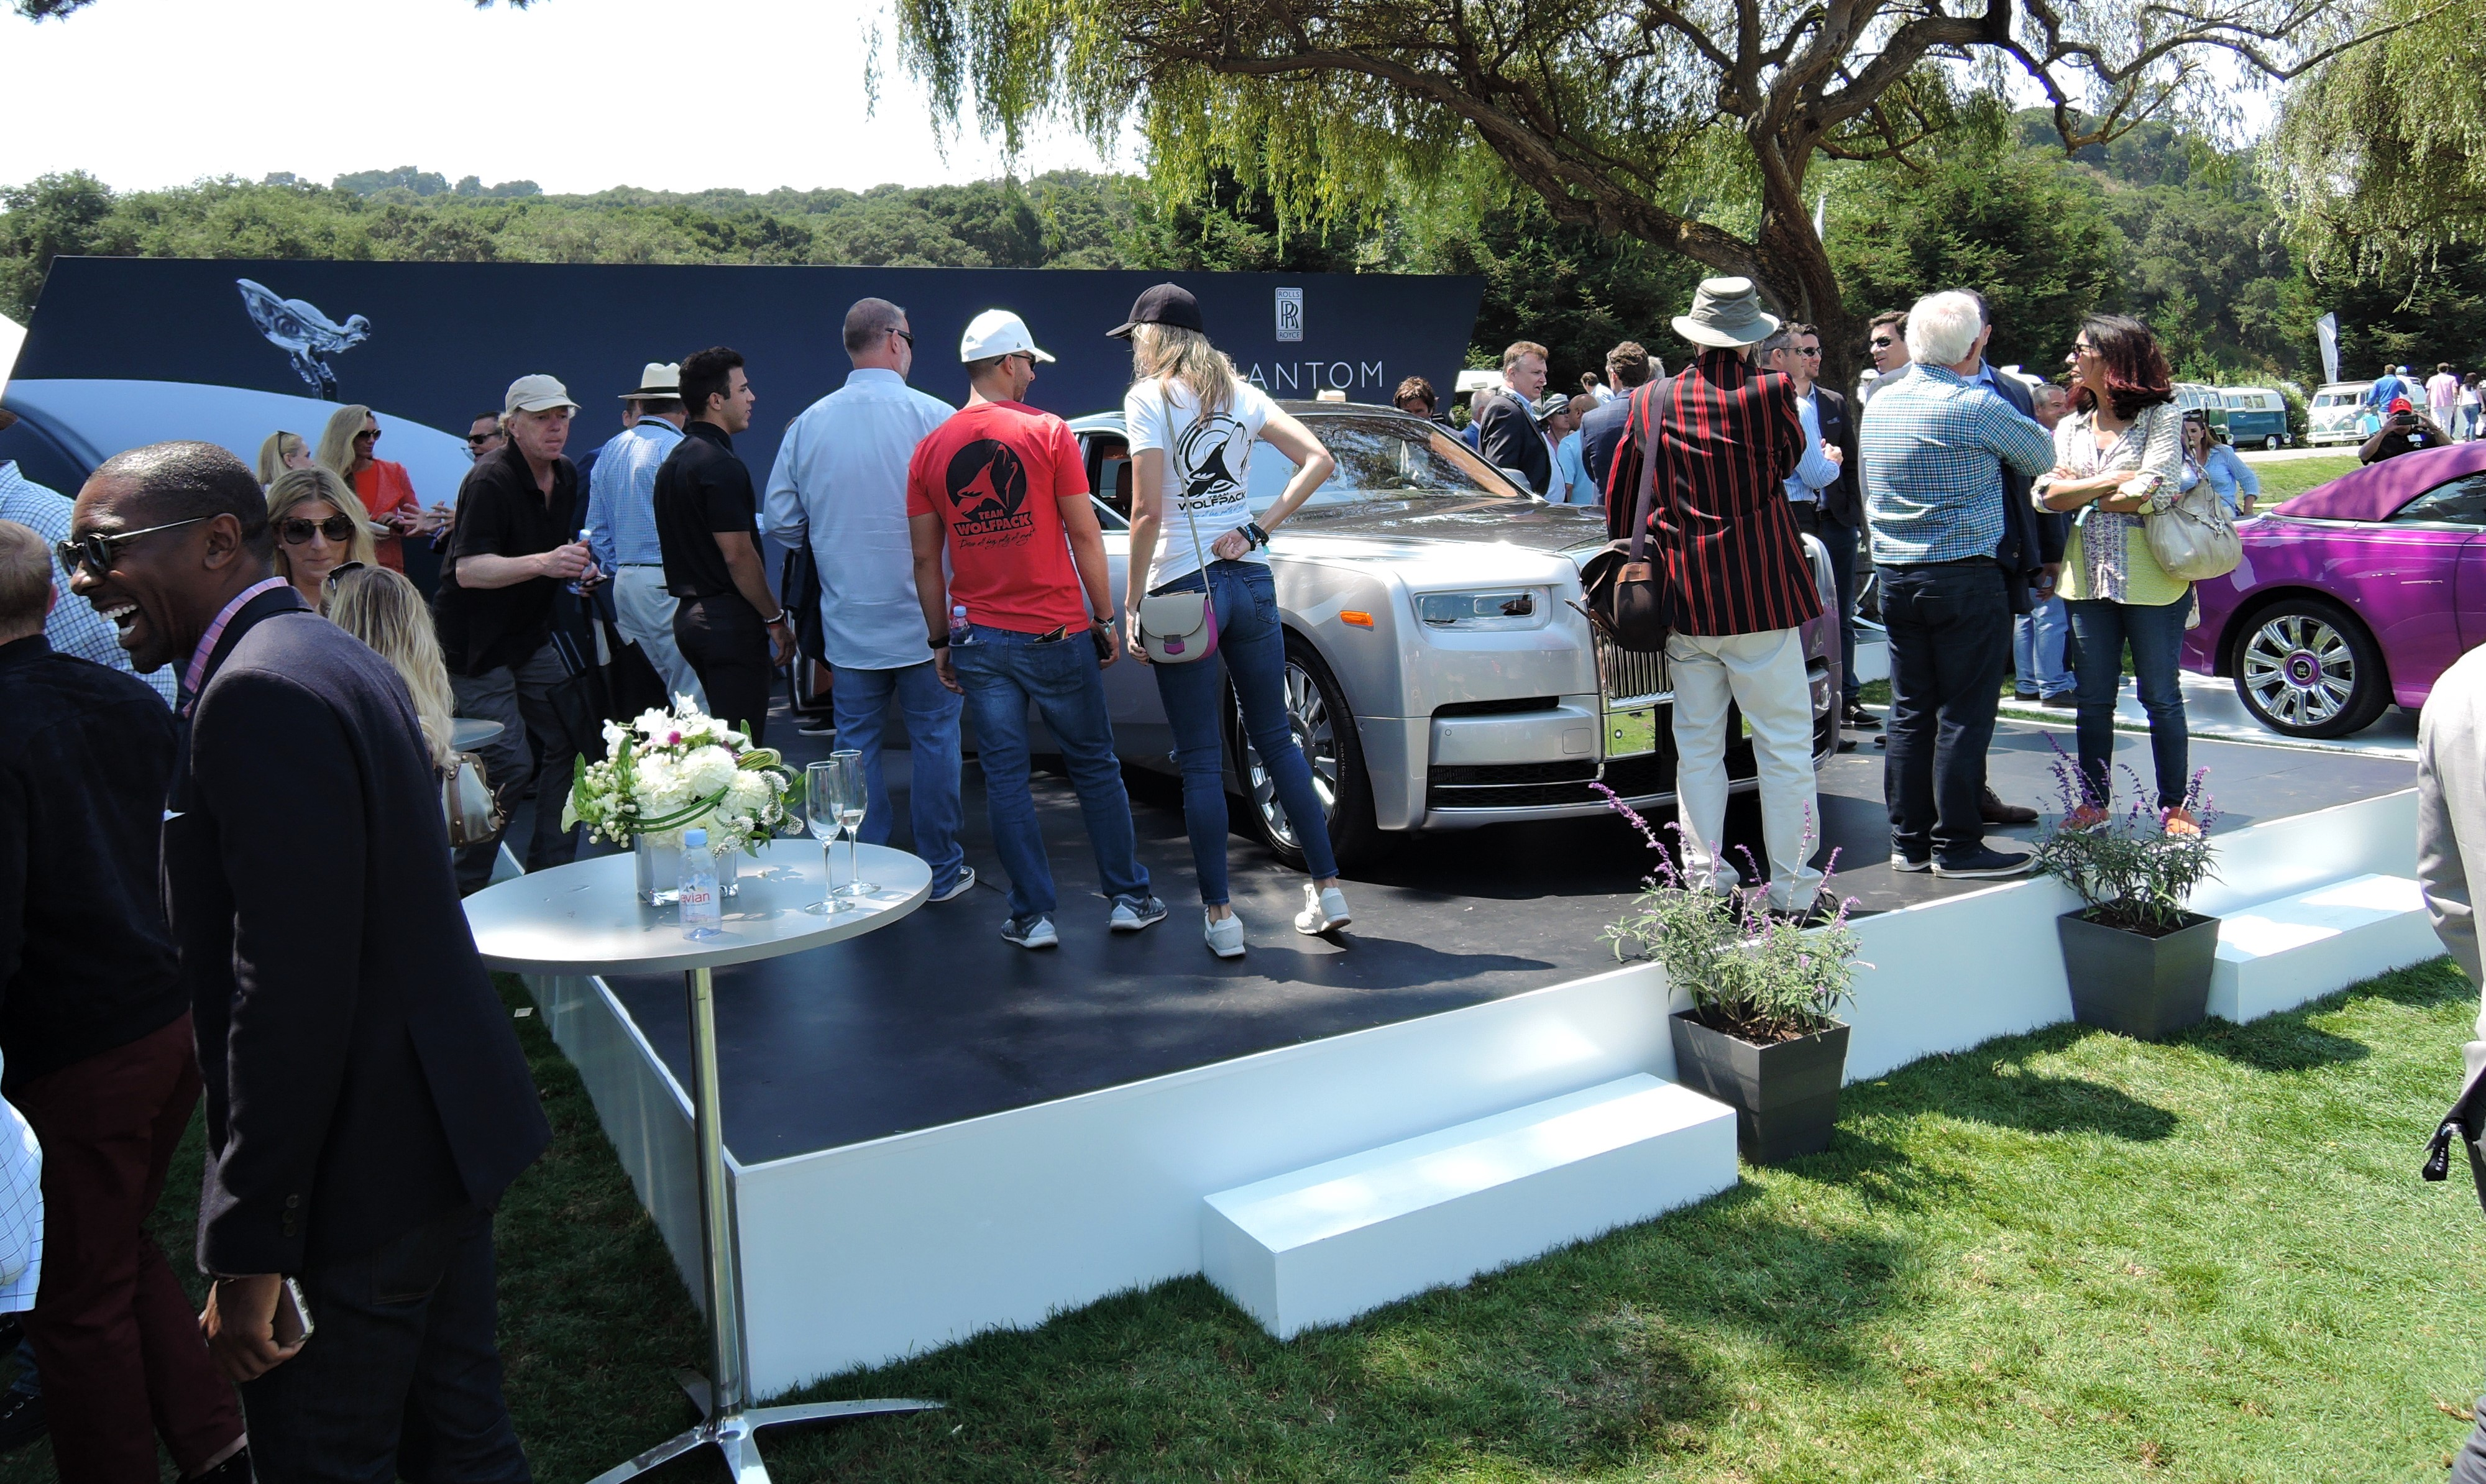 Rolls Royce - The Quail 2017